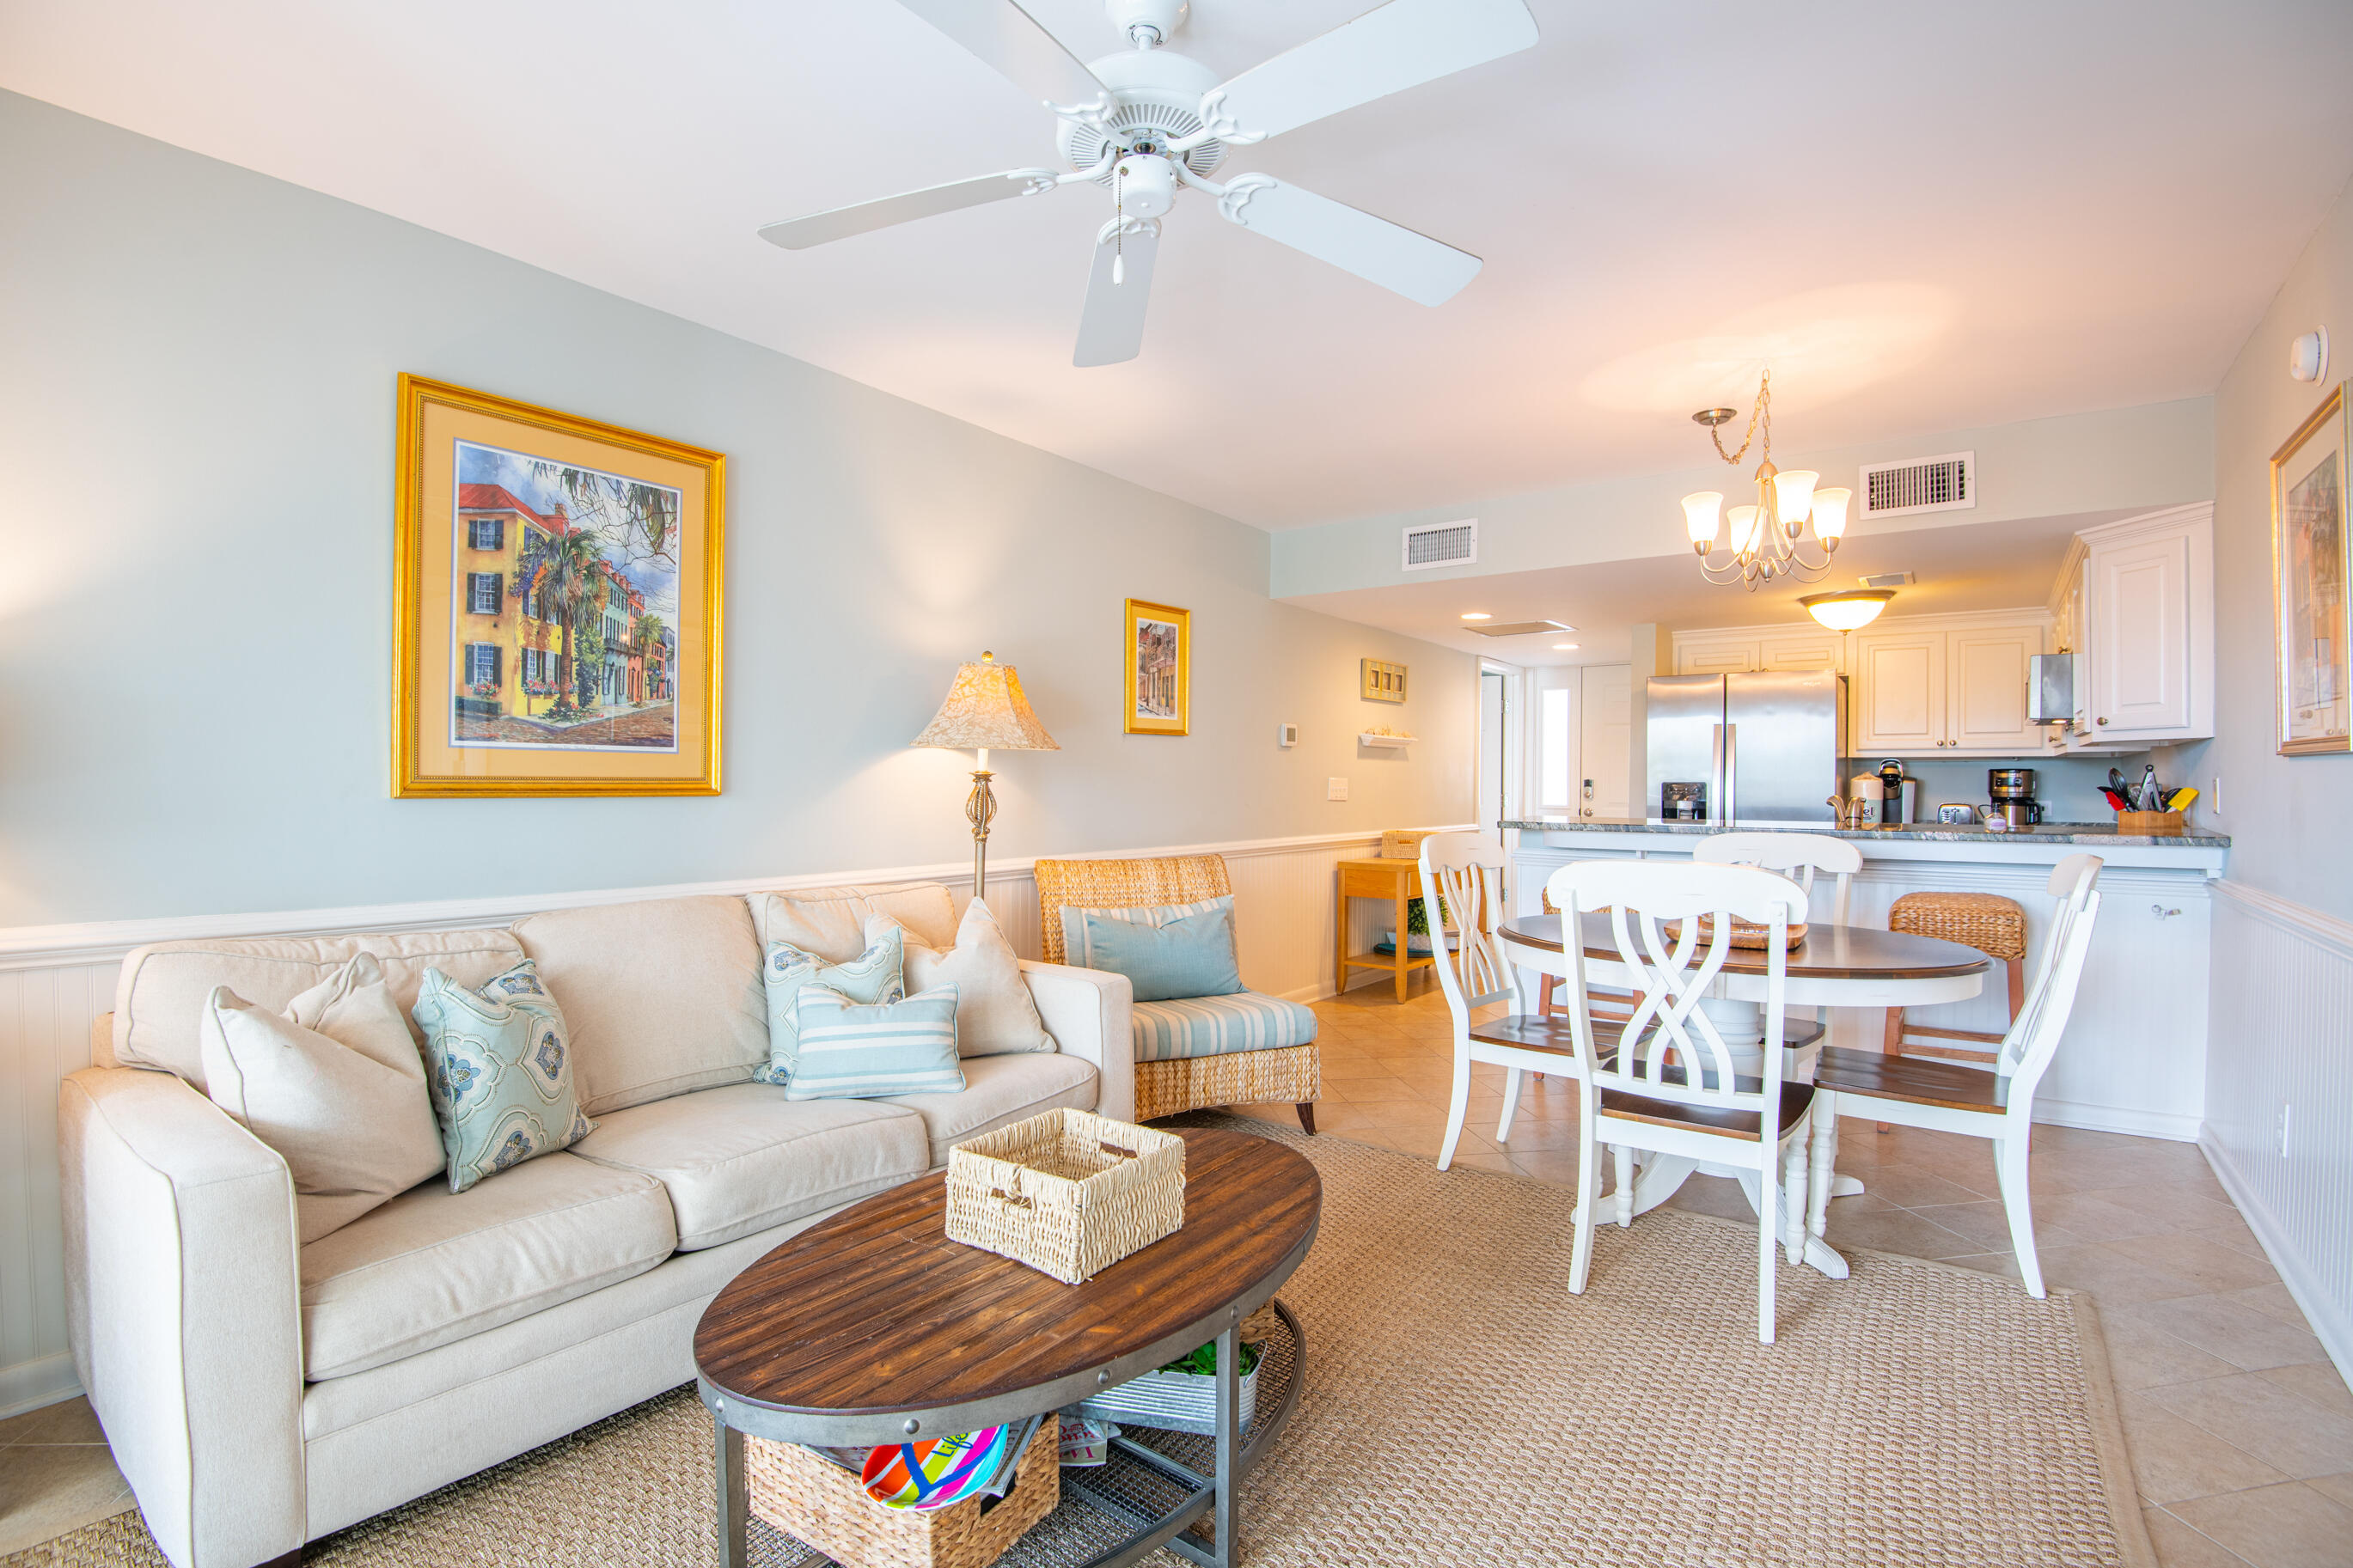 Atrium Villas Homes For Sale - 2935 Atrium Villa, Seabrook Island, SC - 10